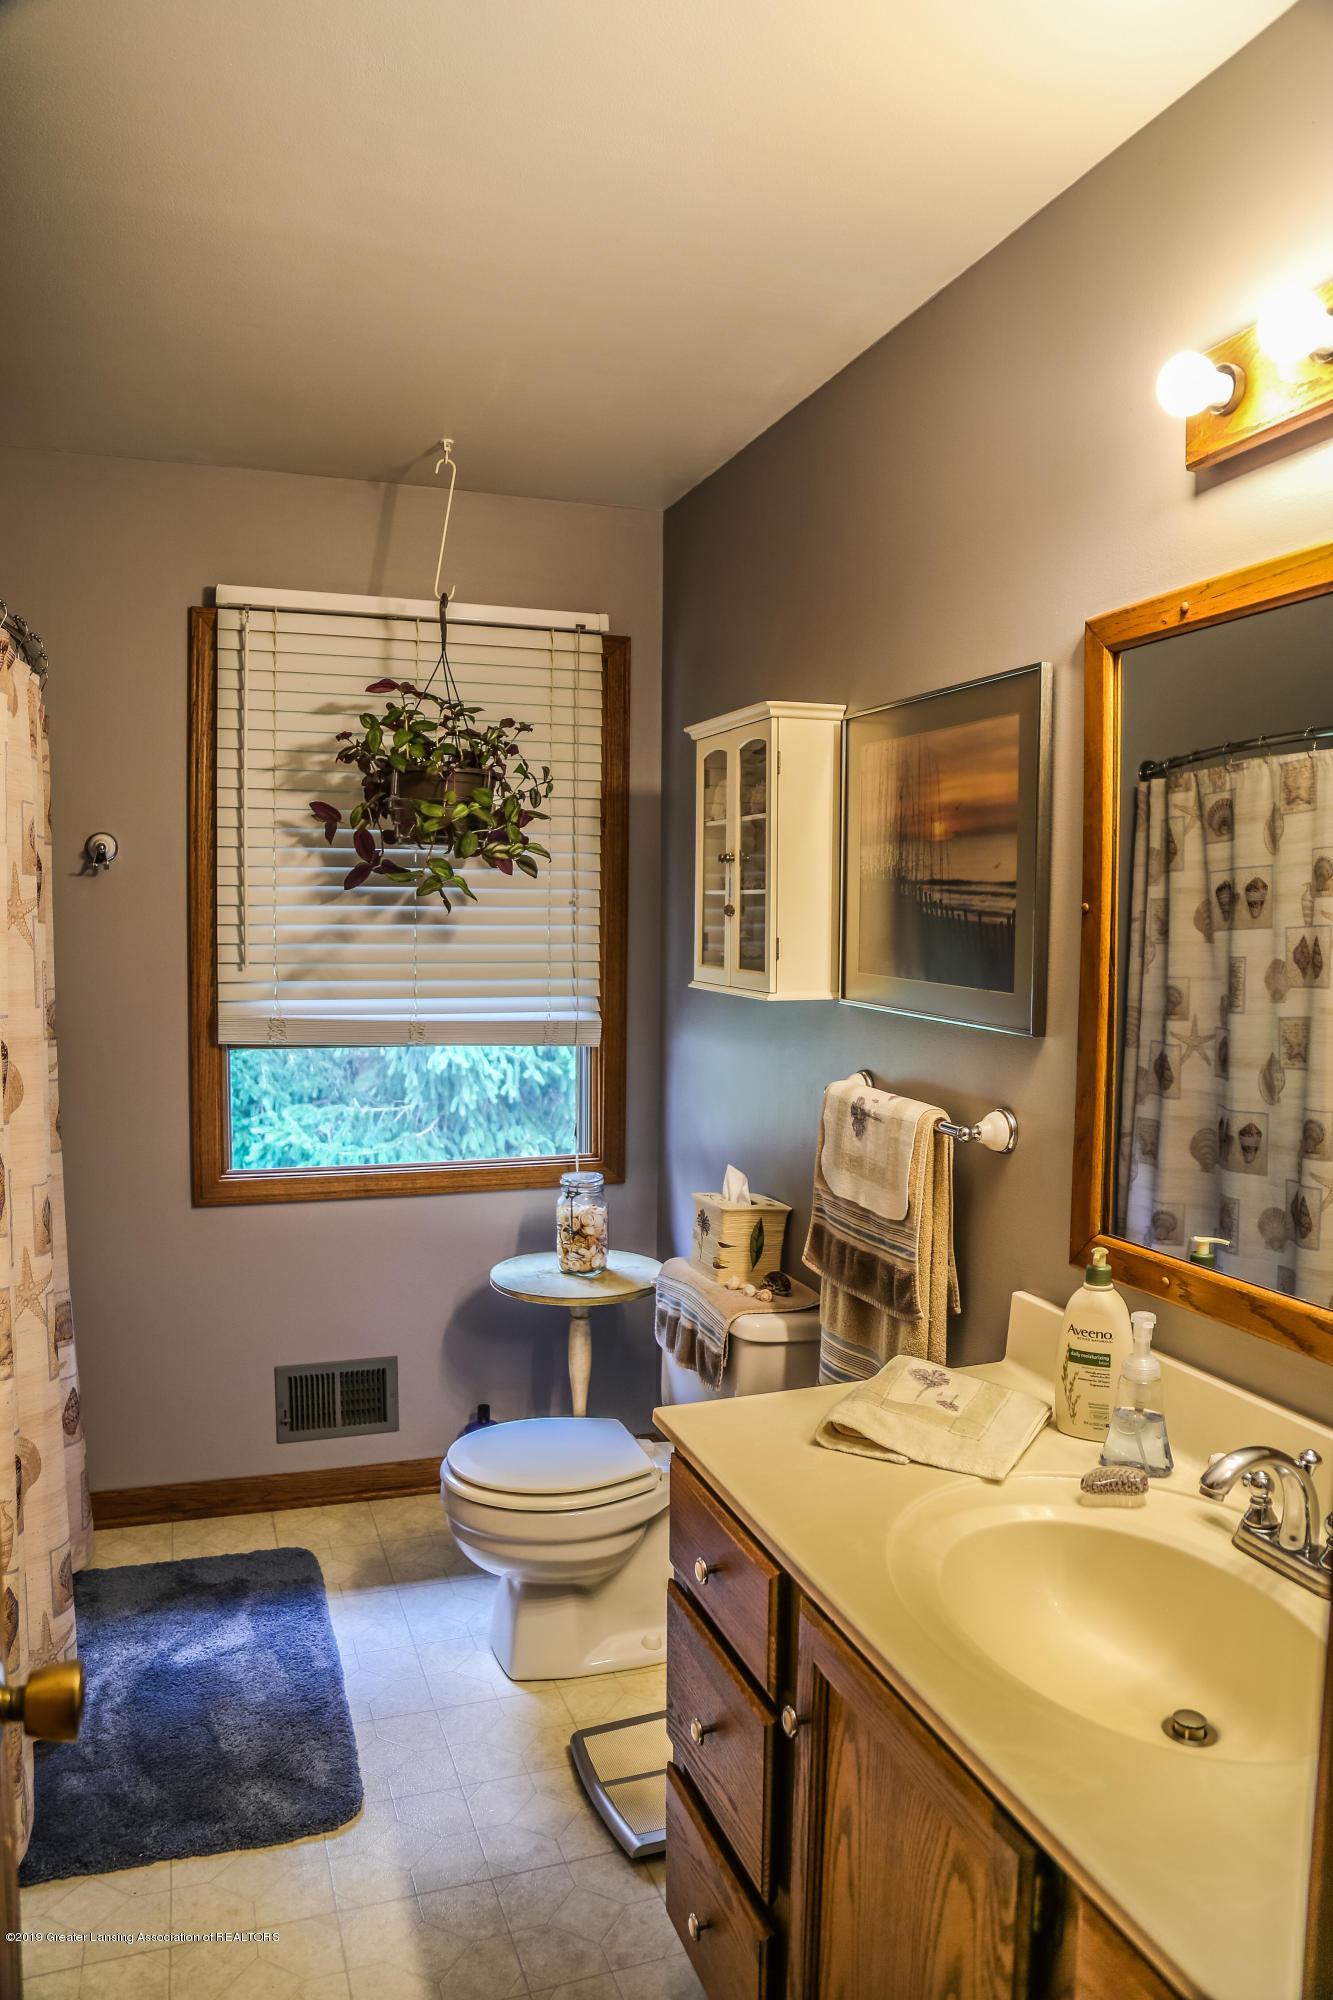 812 S Waverly Rd - Bathroom - 26